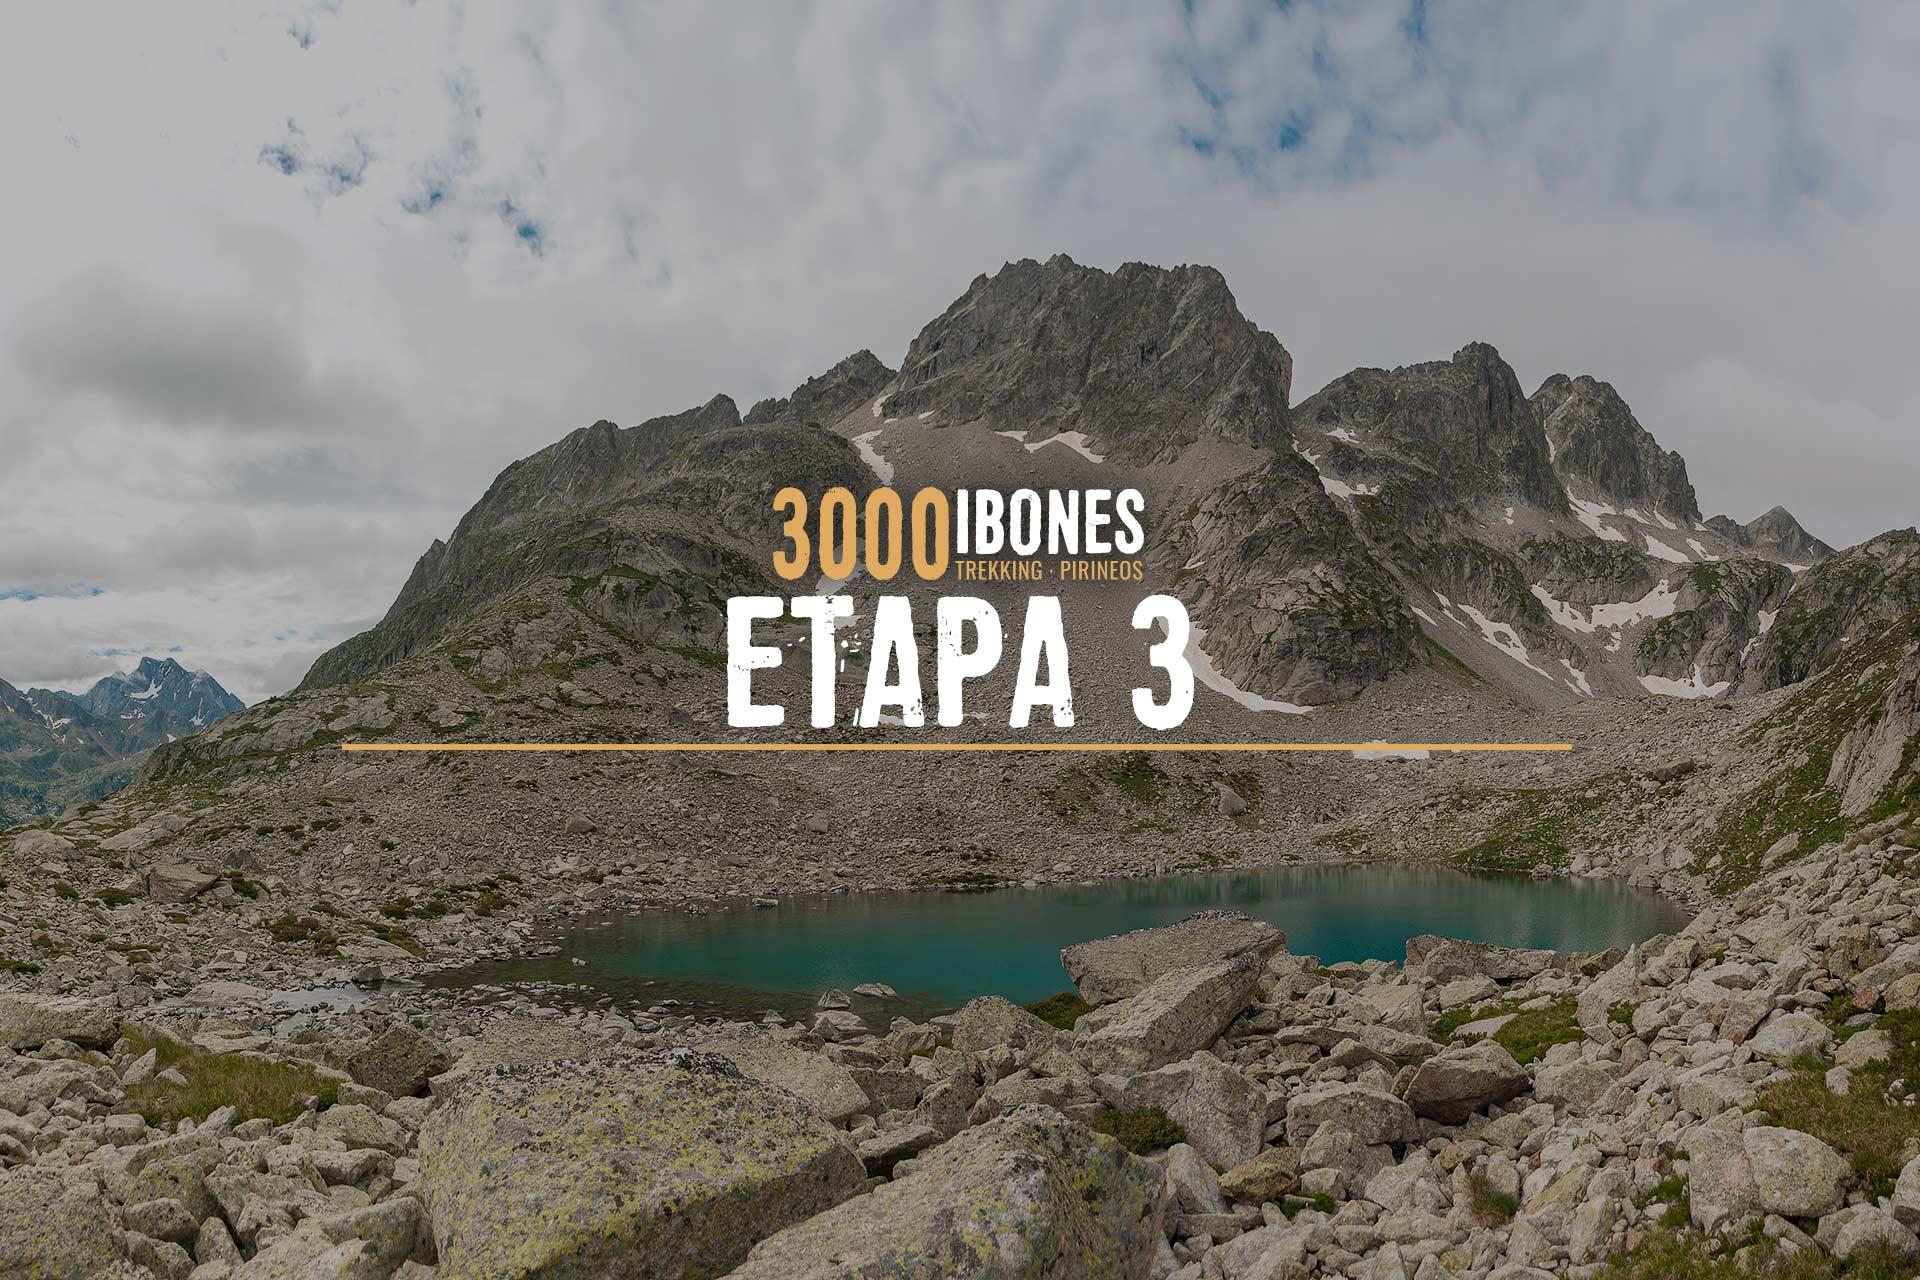 ETAPA 3 3000 IBONES